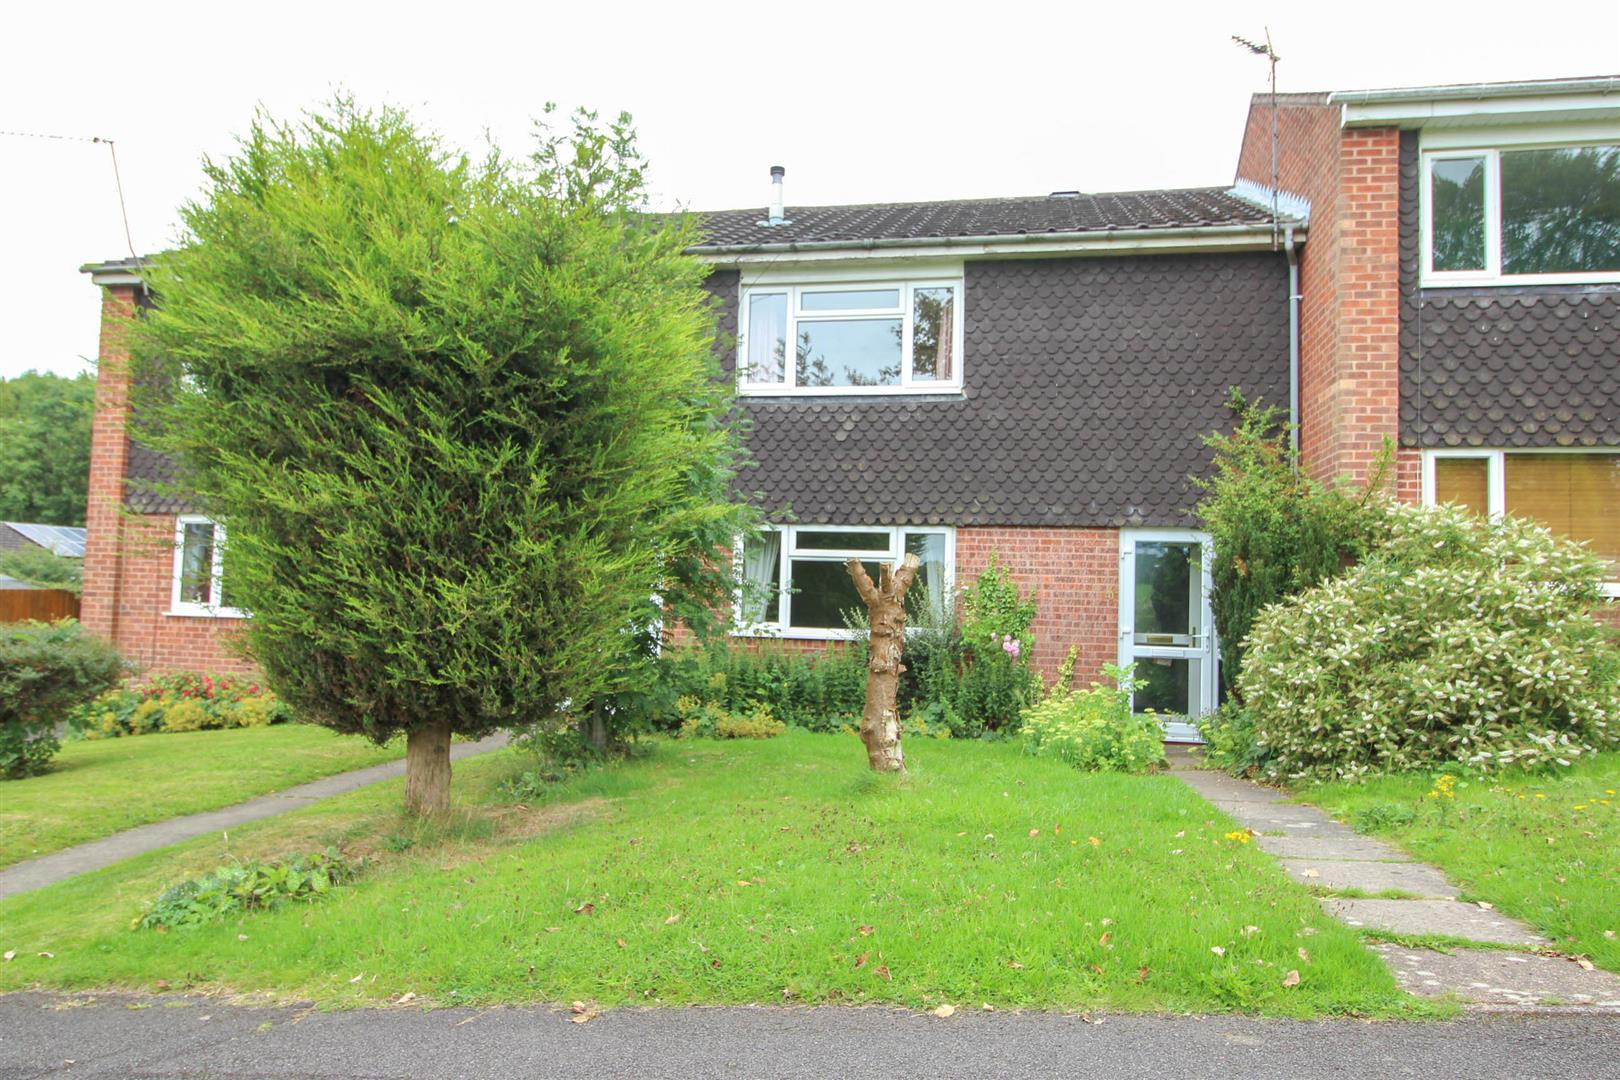 2 Bedrooms Property for sale in Lea Croft Road, Crabbs Cross, Redditch